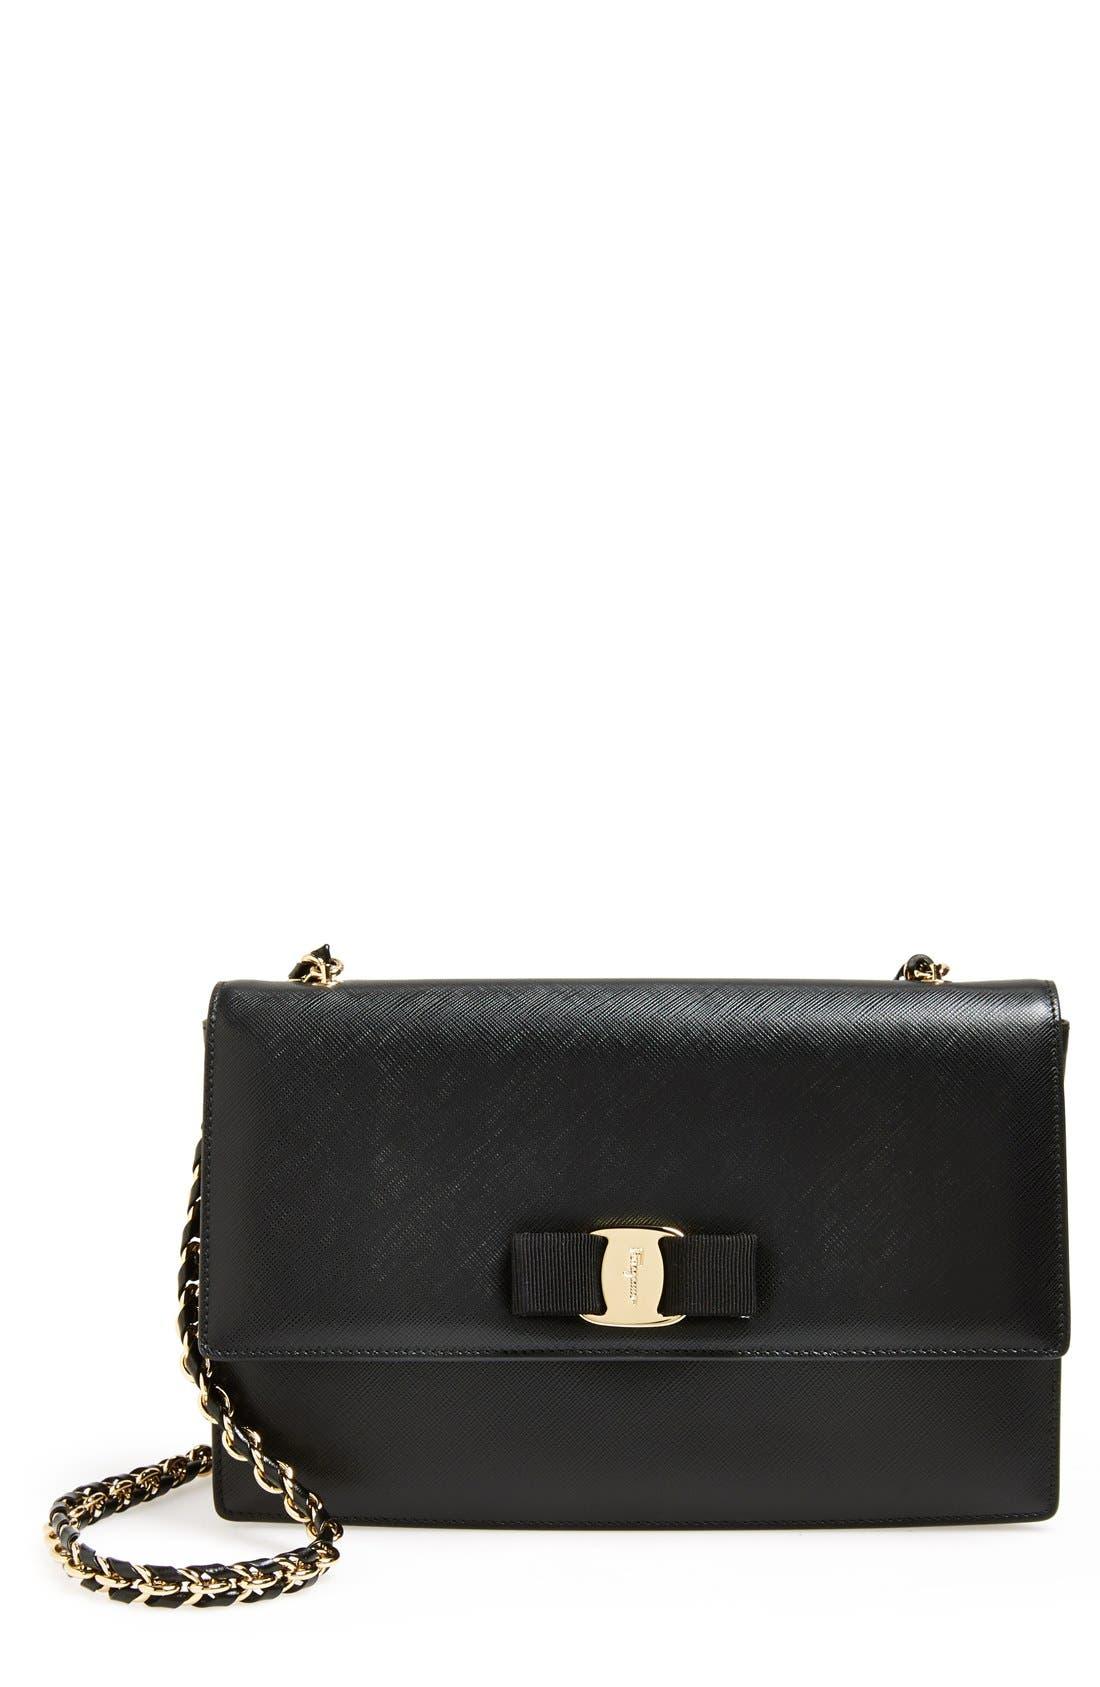 Saffiano Leather Shoulder Bag,                         Main,                         color, Nero